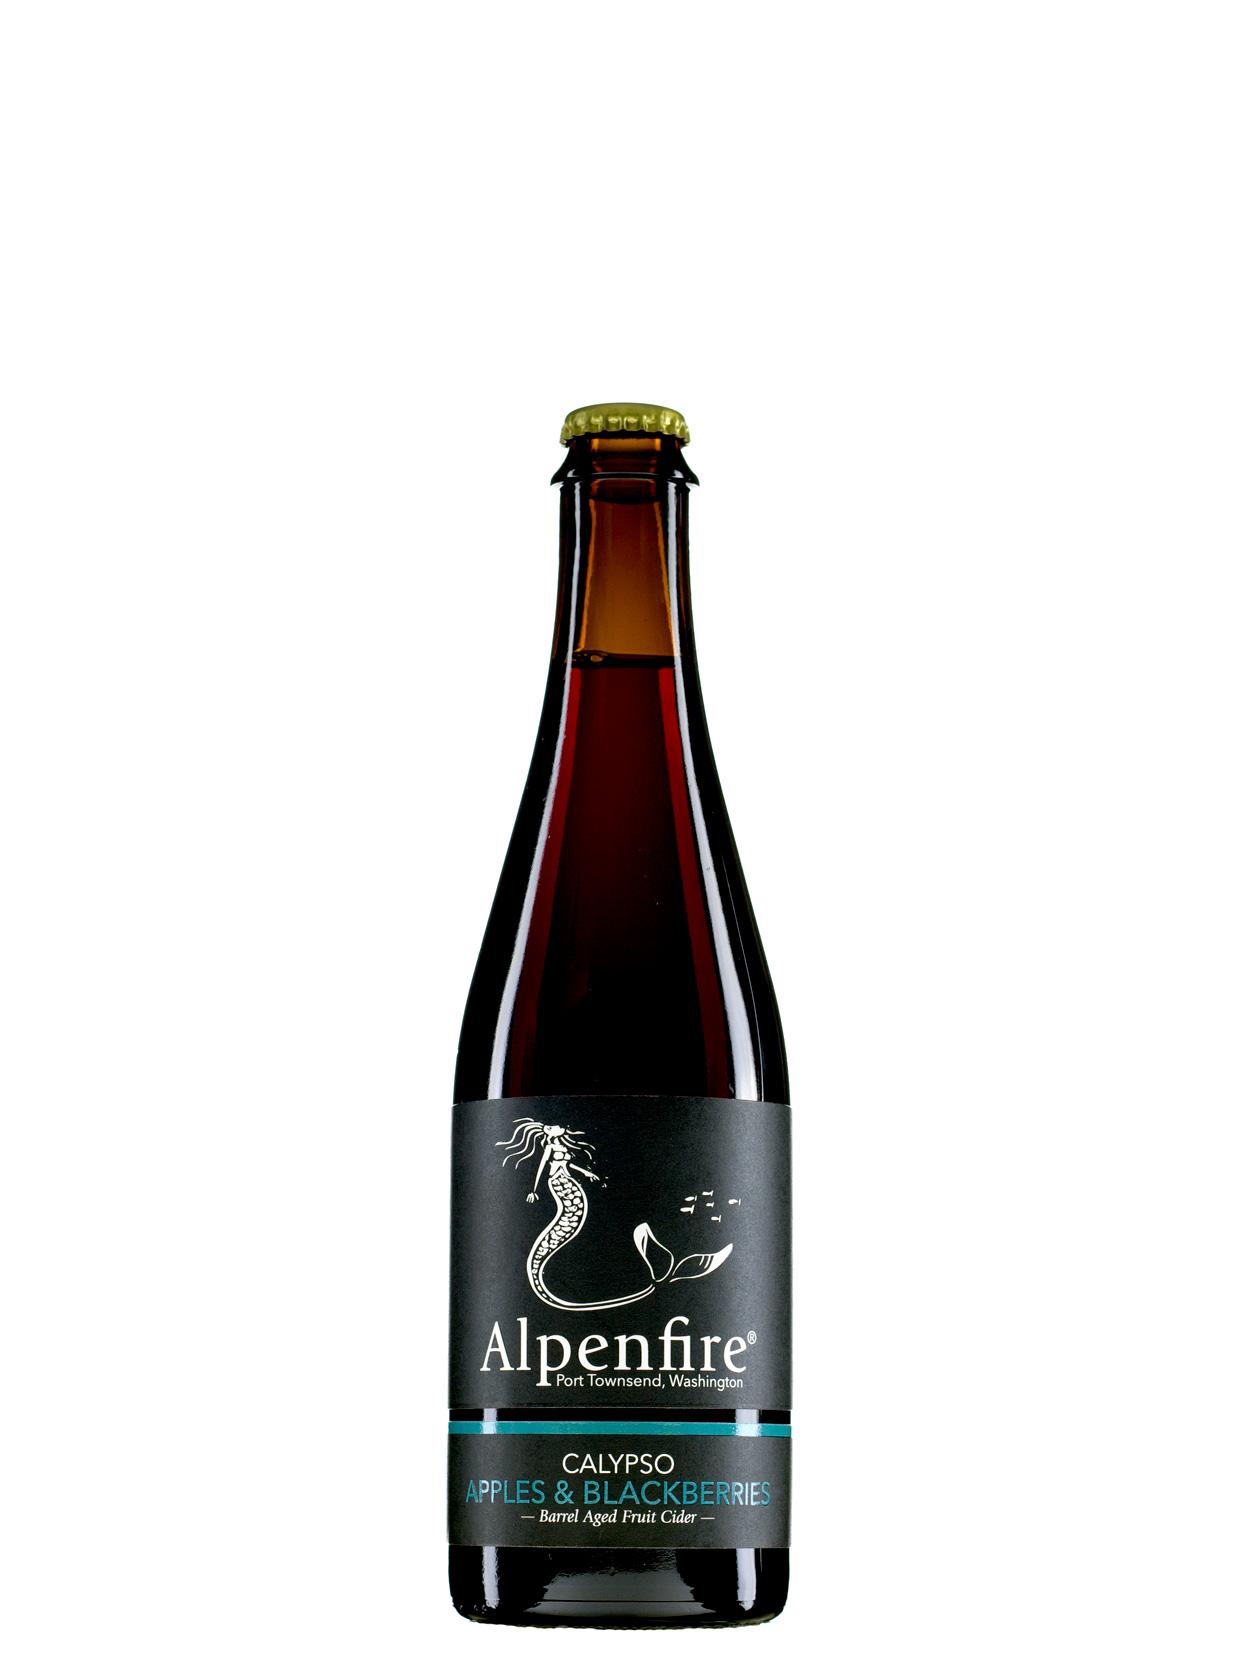 Alpenfire-Calypso-Apples-and-Blackberries-Cider.jpg